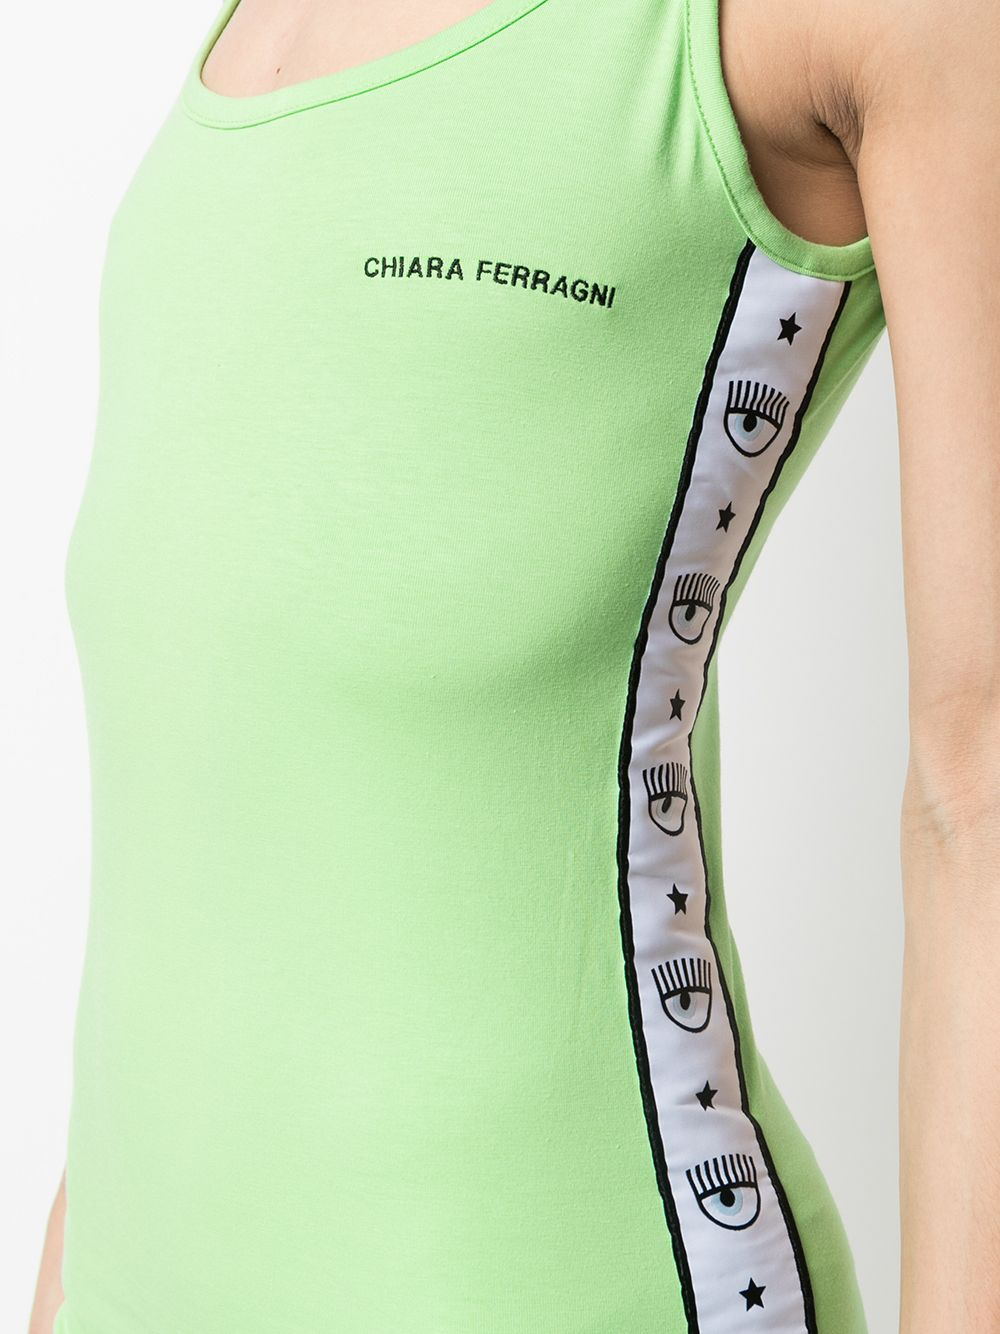 CHIARA FERRAGNI      CFDR050GREEN